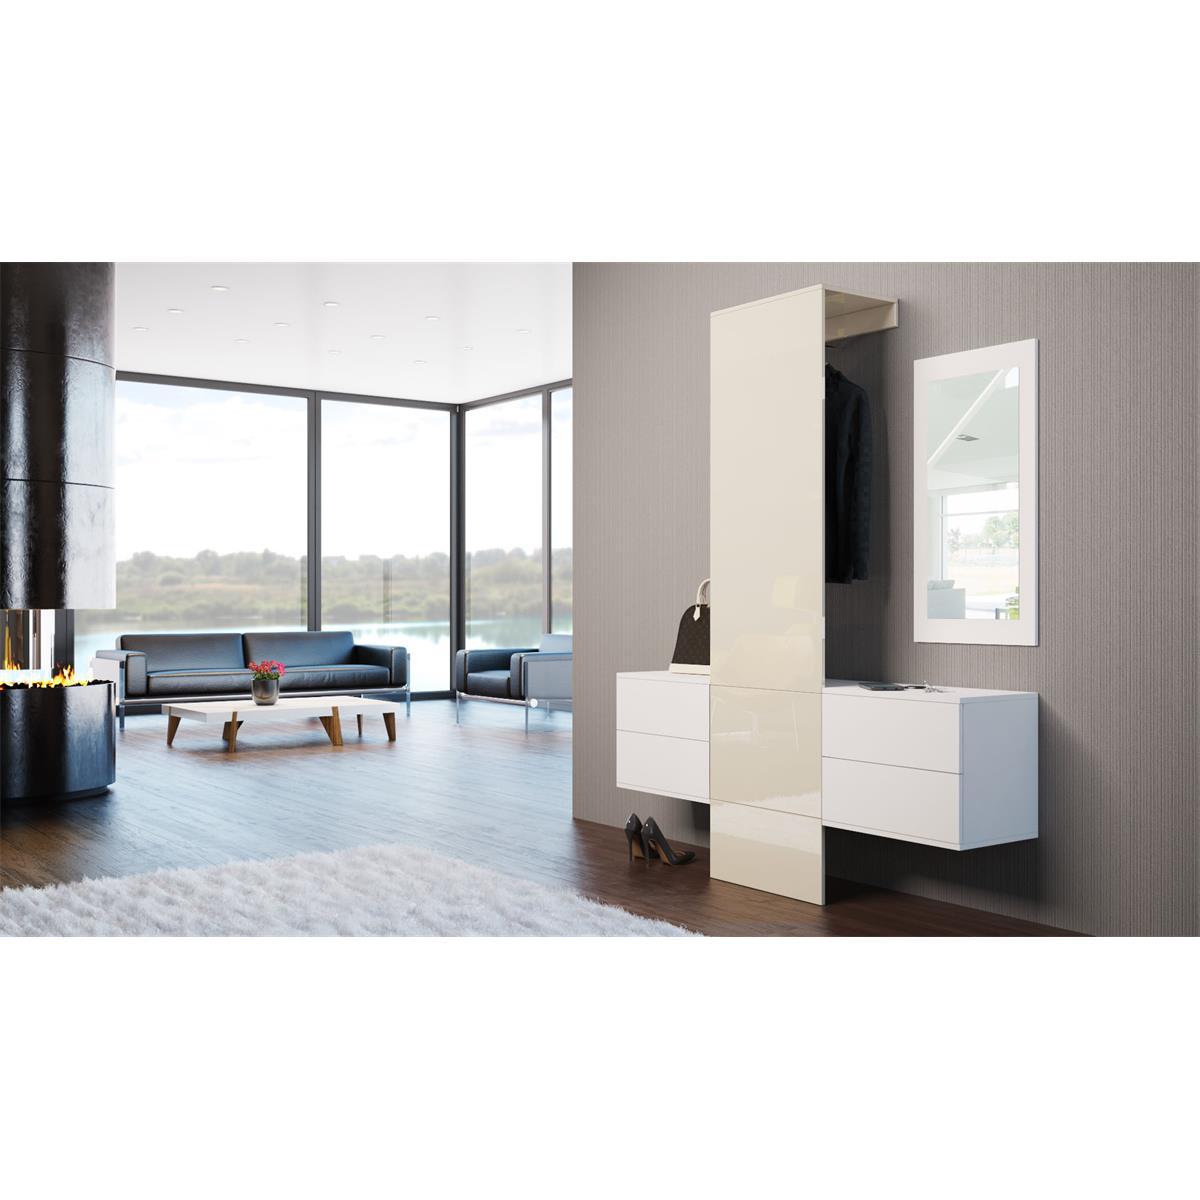 garderobe carlton set 3 inkl spiegel variable module. Black Bedroom Furniture Sets. Home Design Ideas